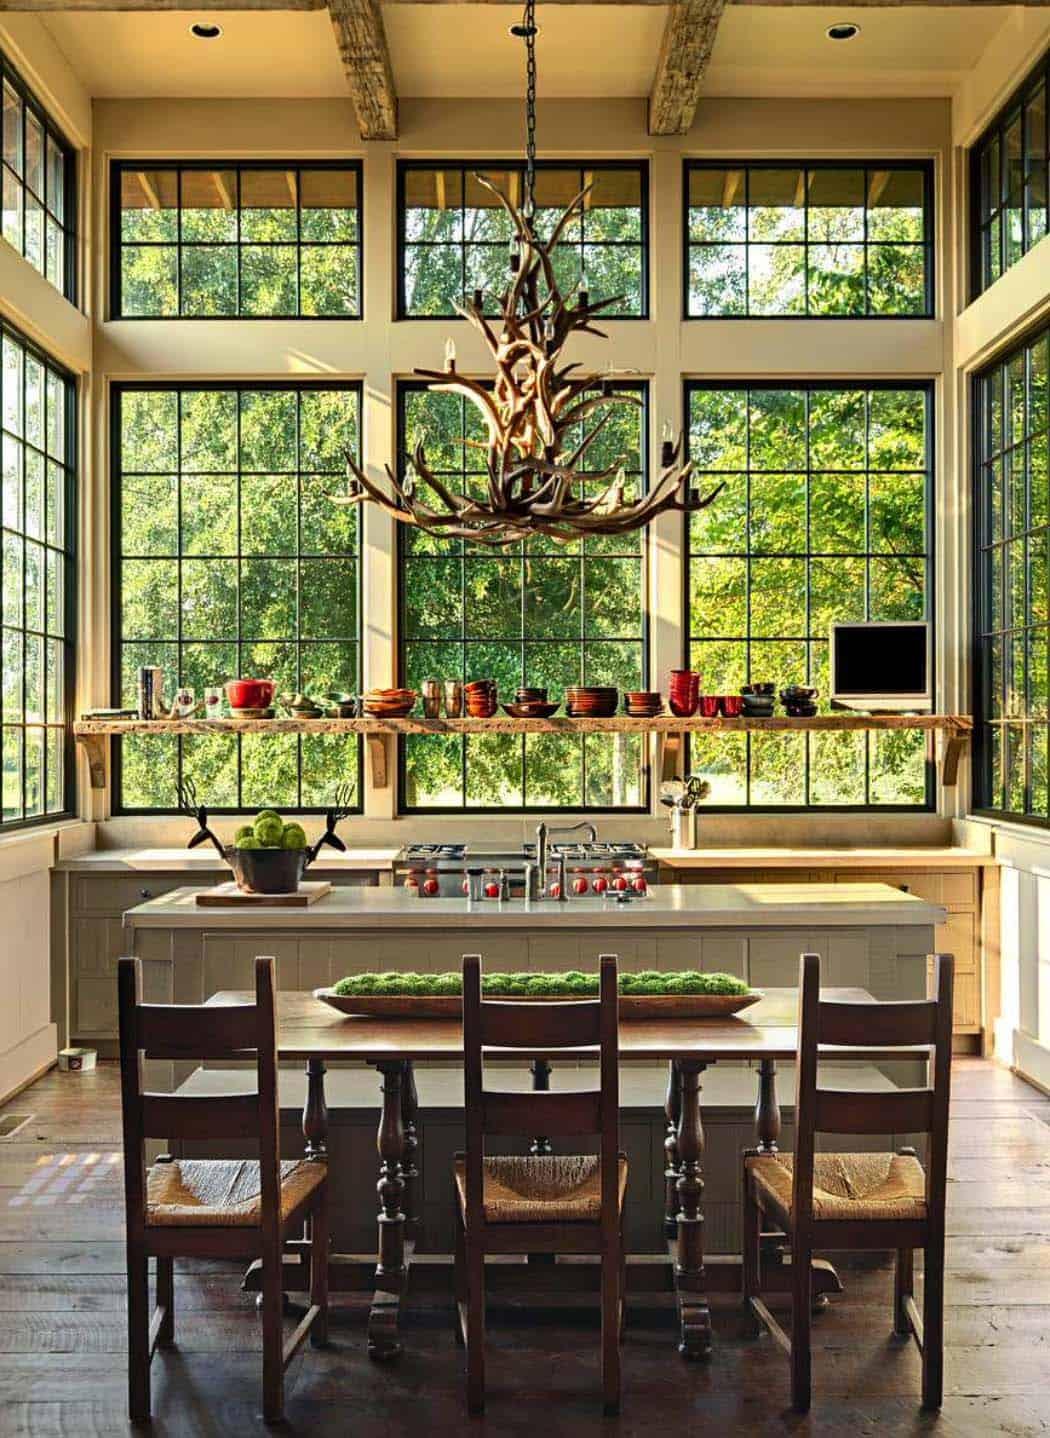 Rustic-Modern Farmhouse-Jeffrey Dungan Architects-01-1 Kindesign